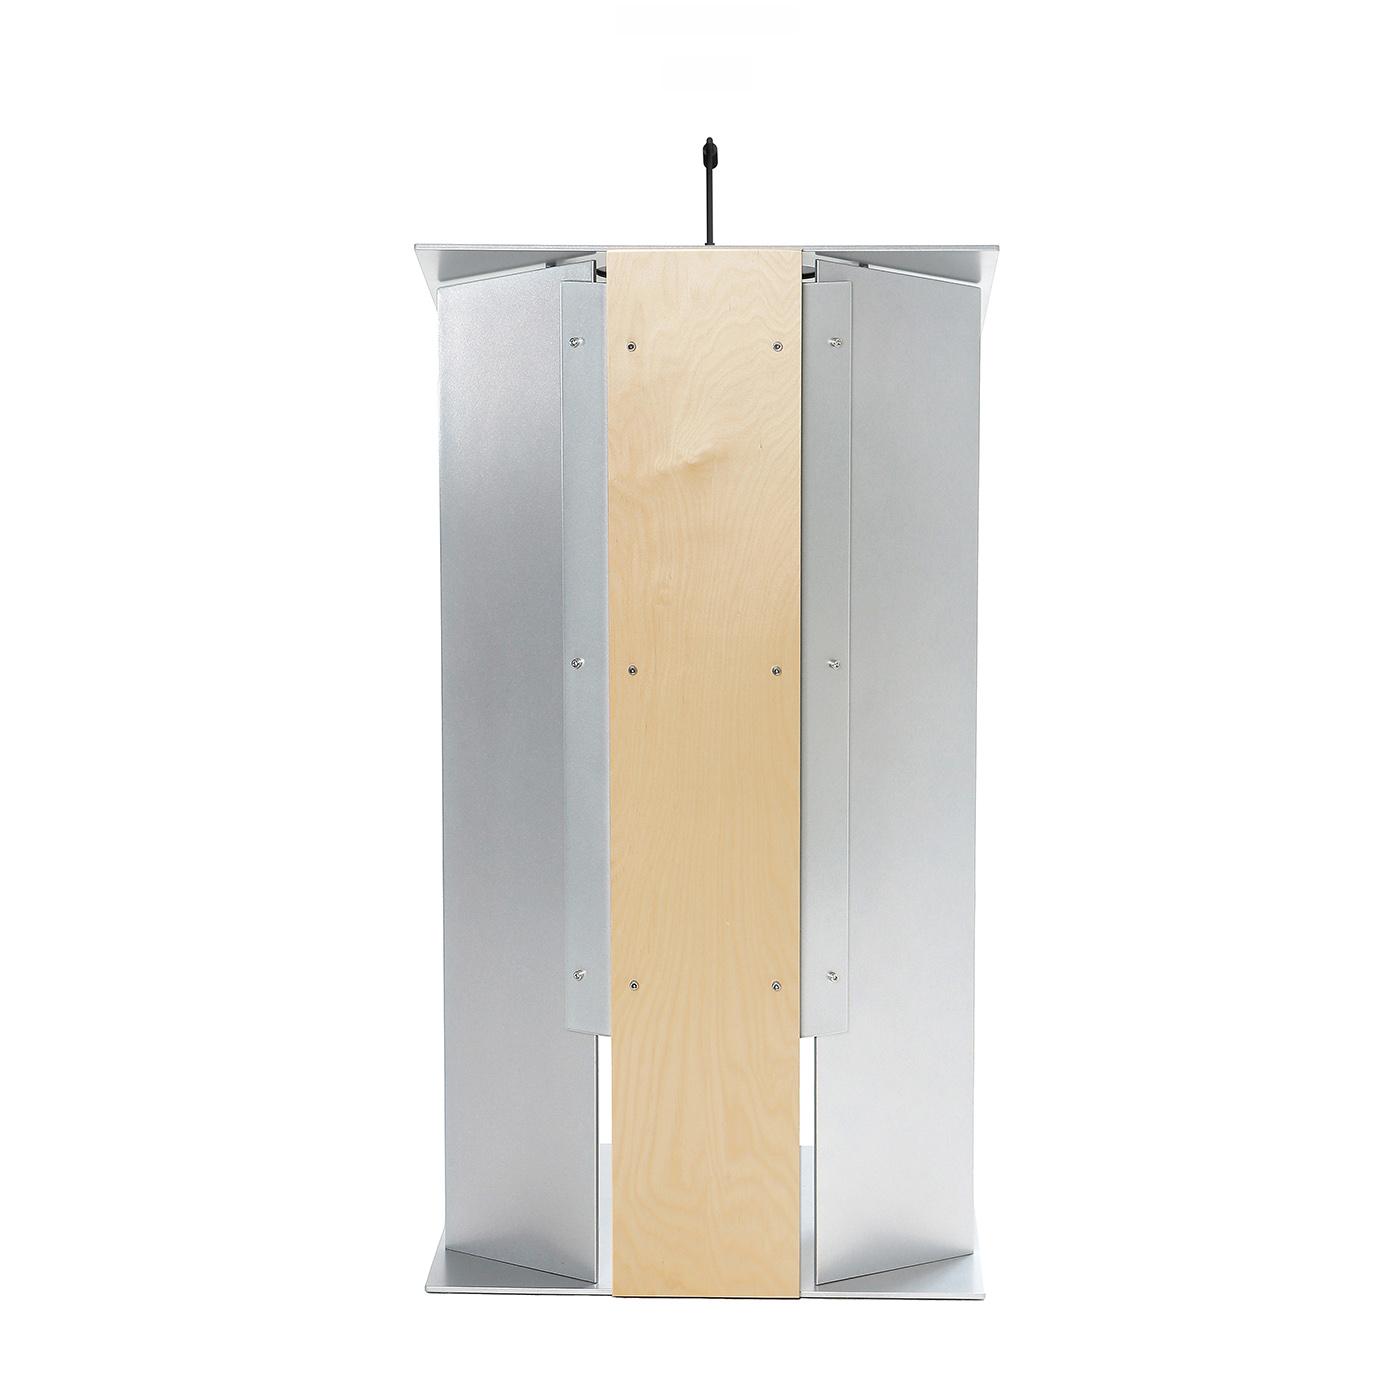 Urbann K6 lectern front